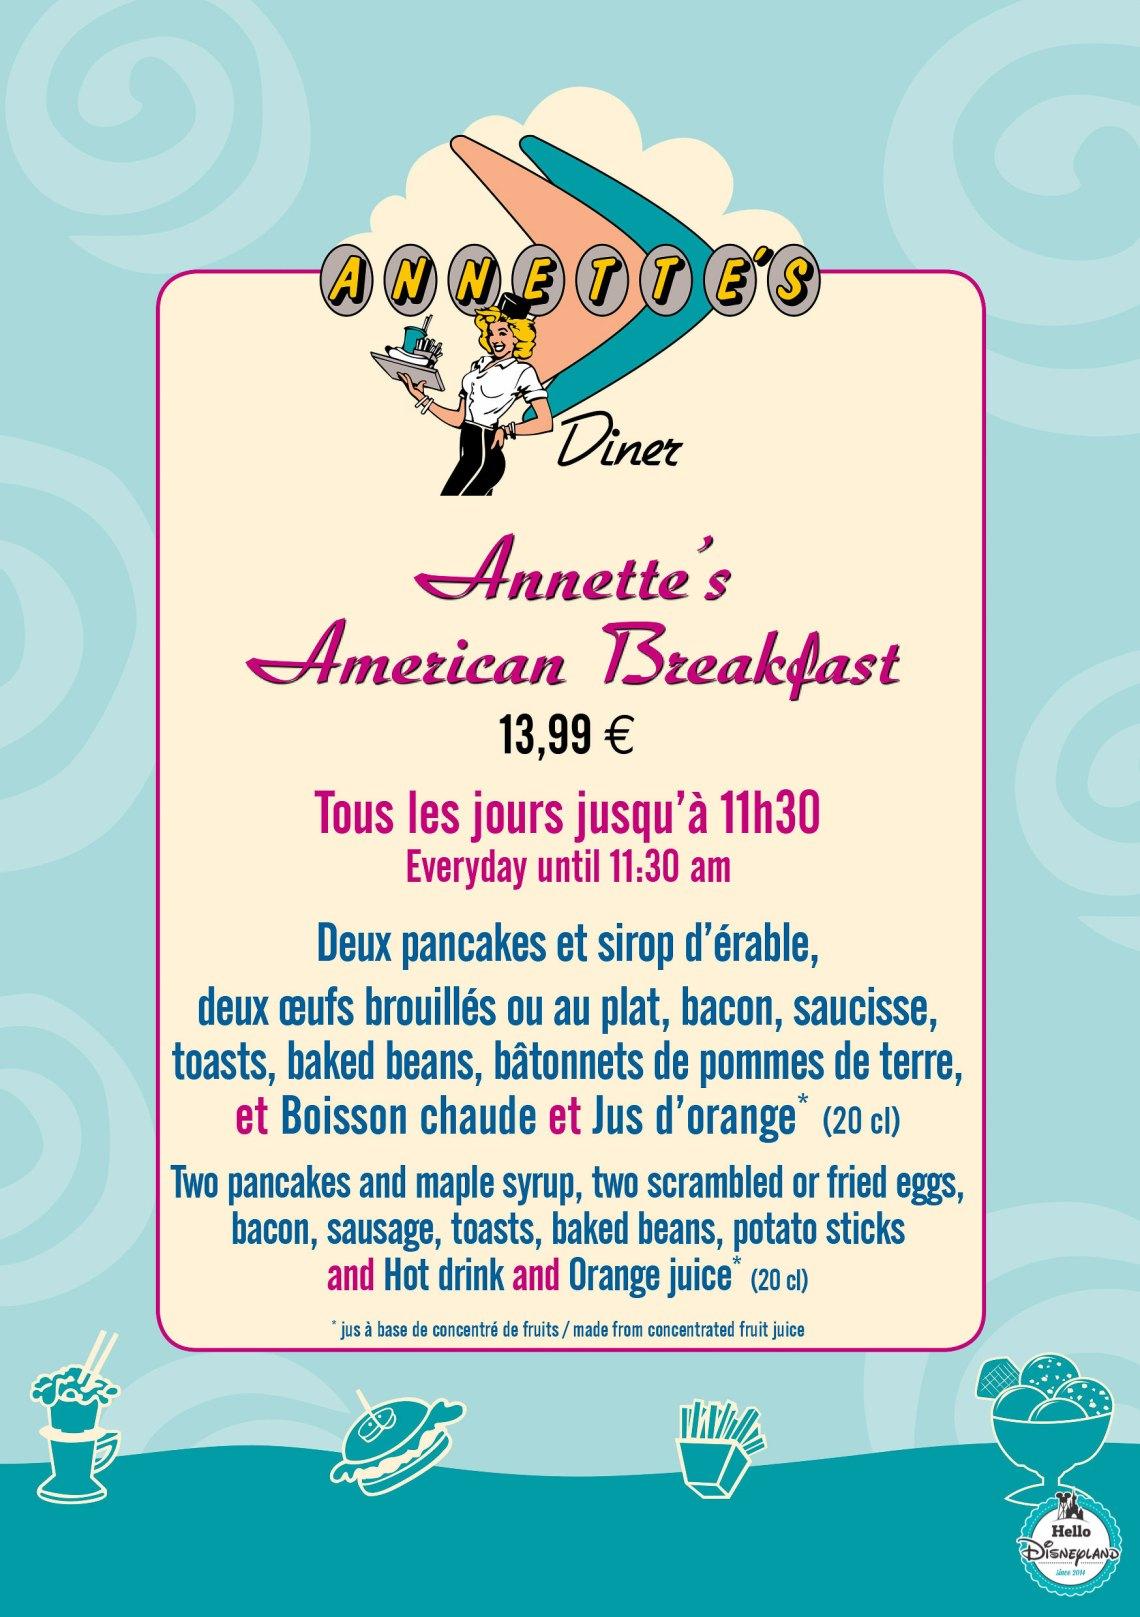 Menu annette's Diner 2017 Disneyland Paris